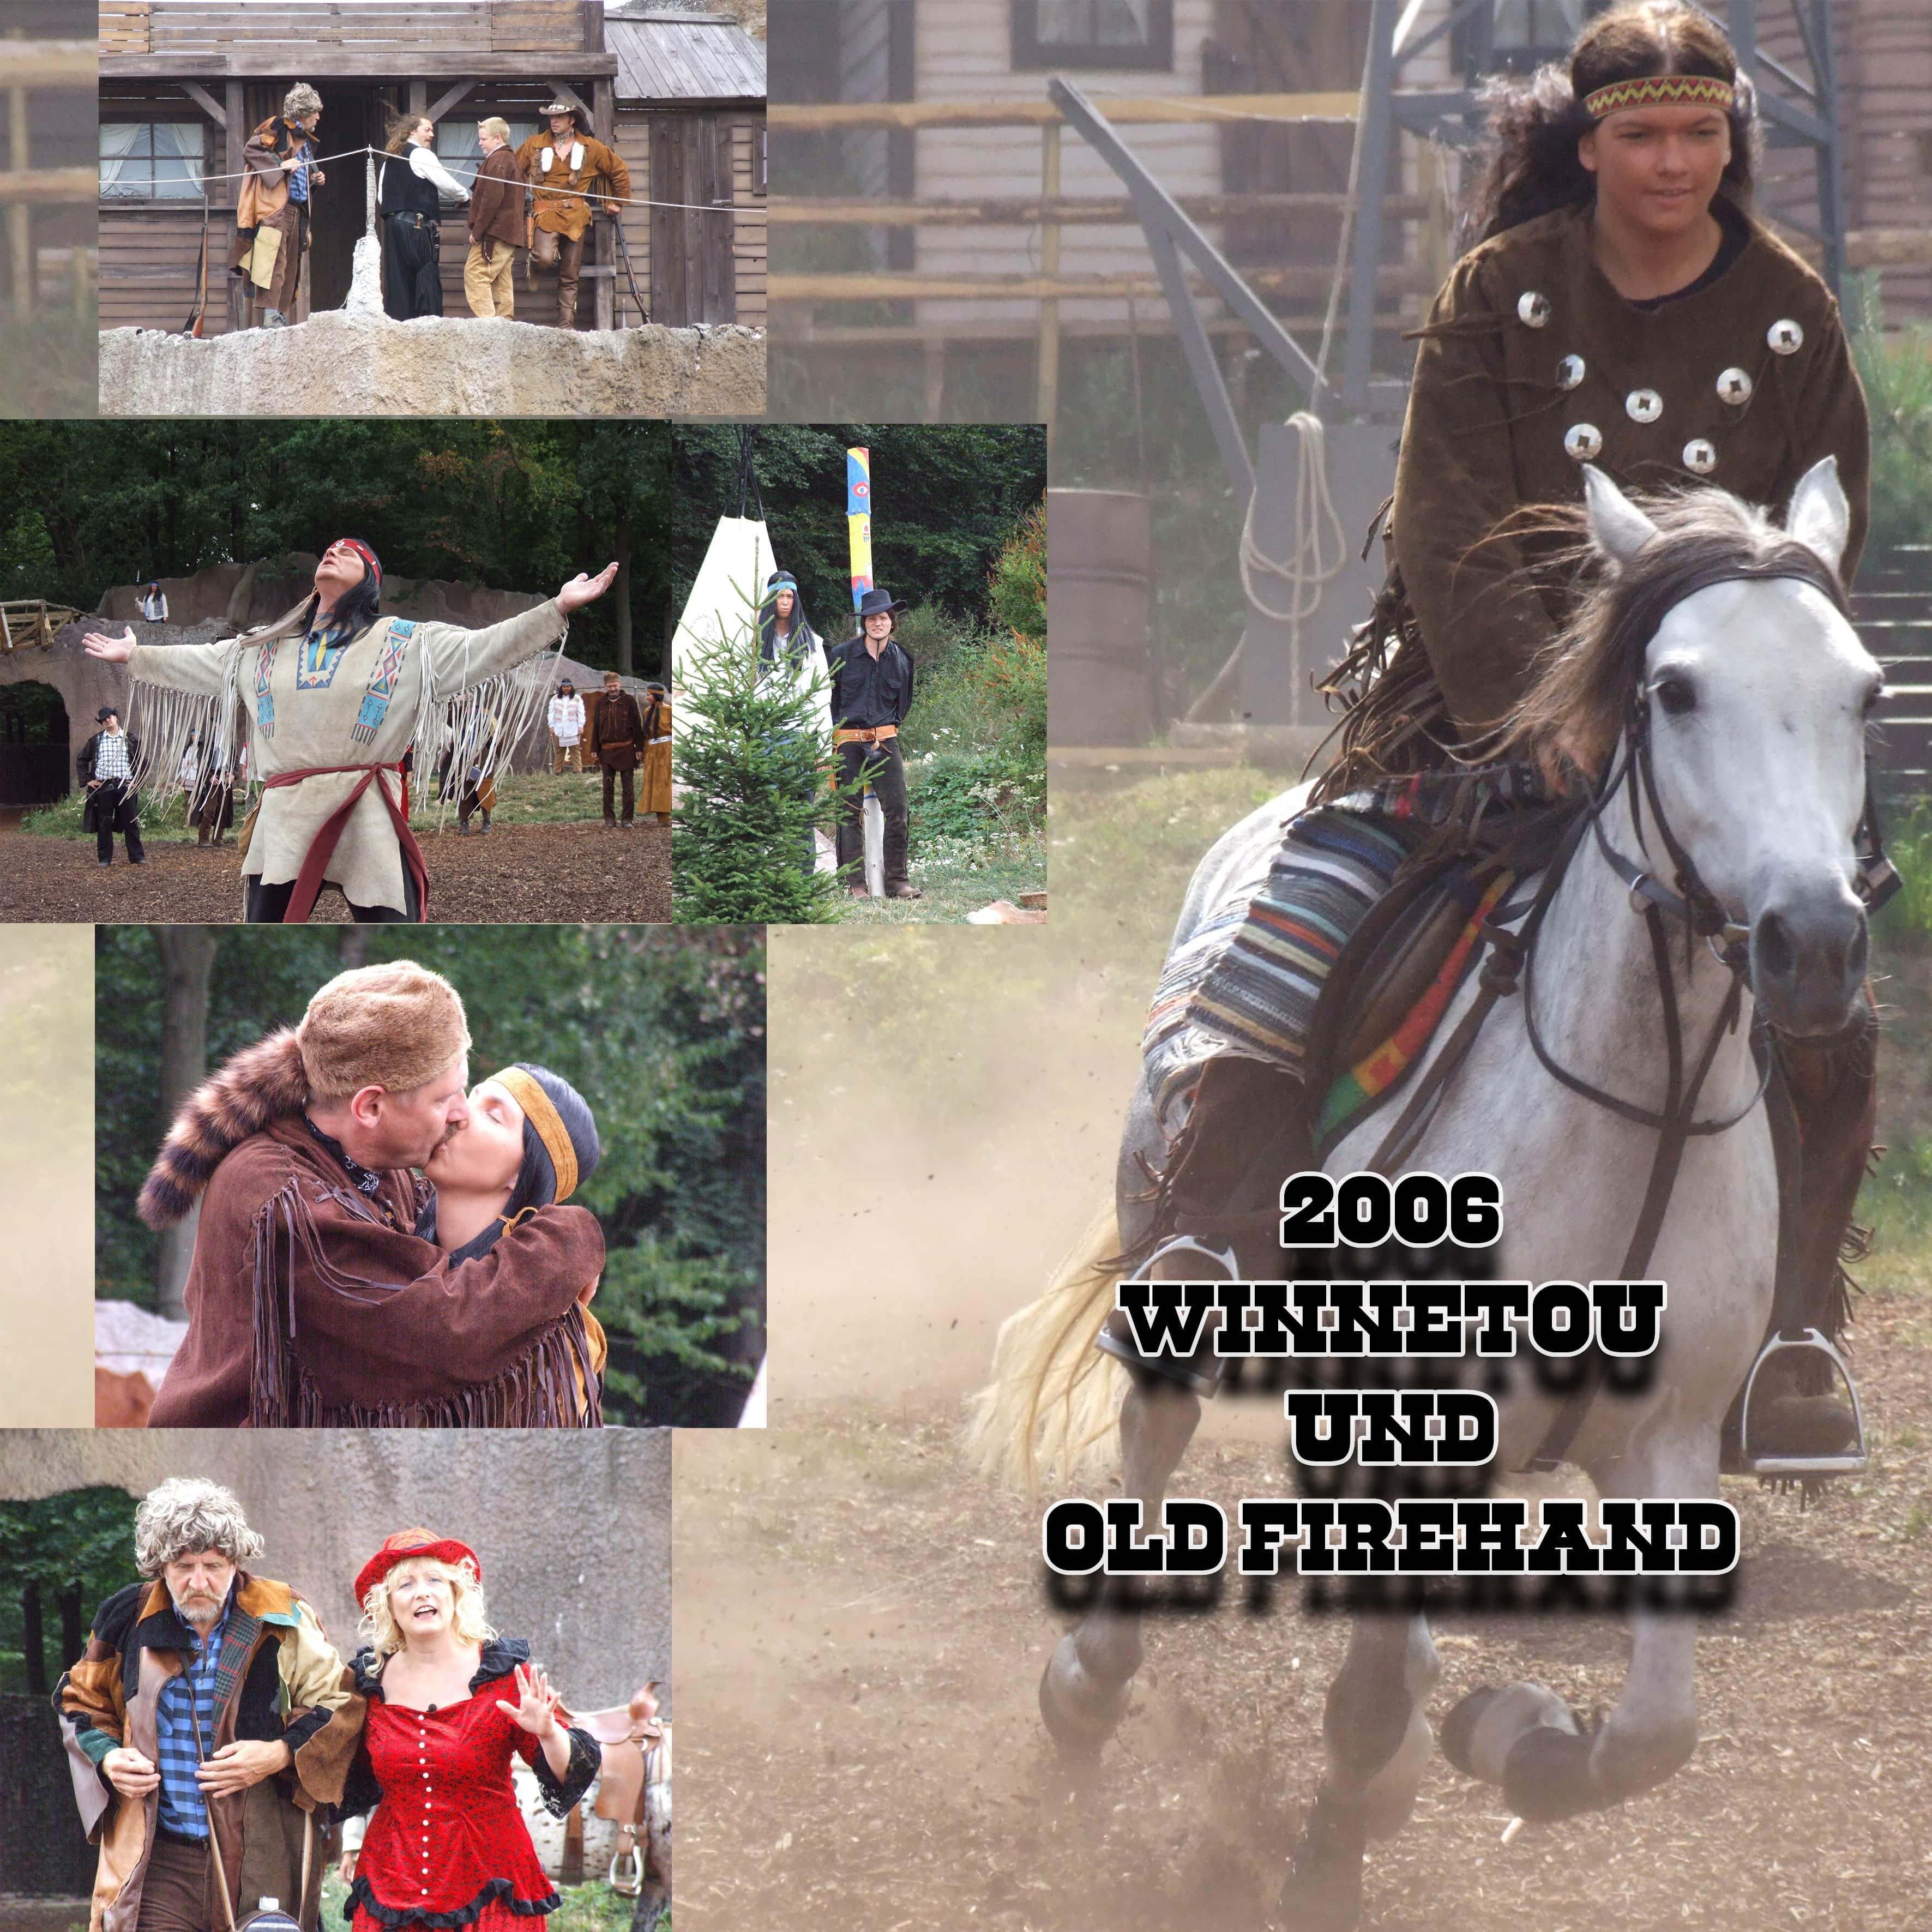 2006 - Winnetou und Old Firehand